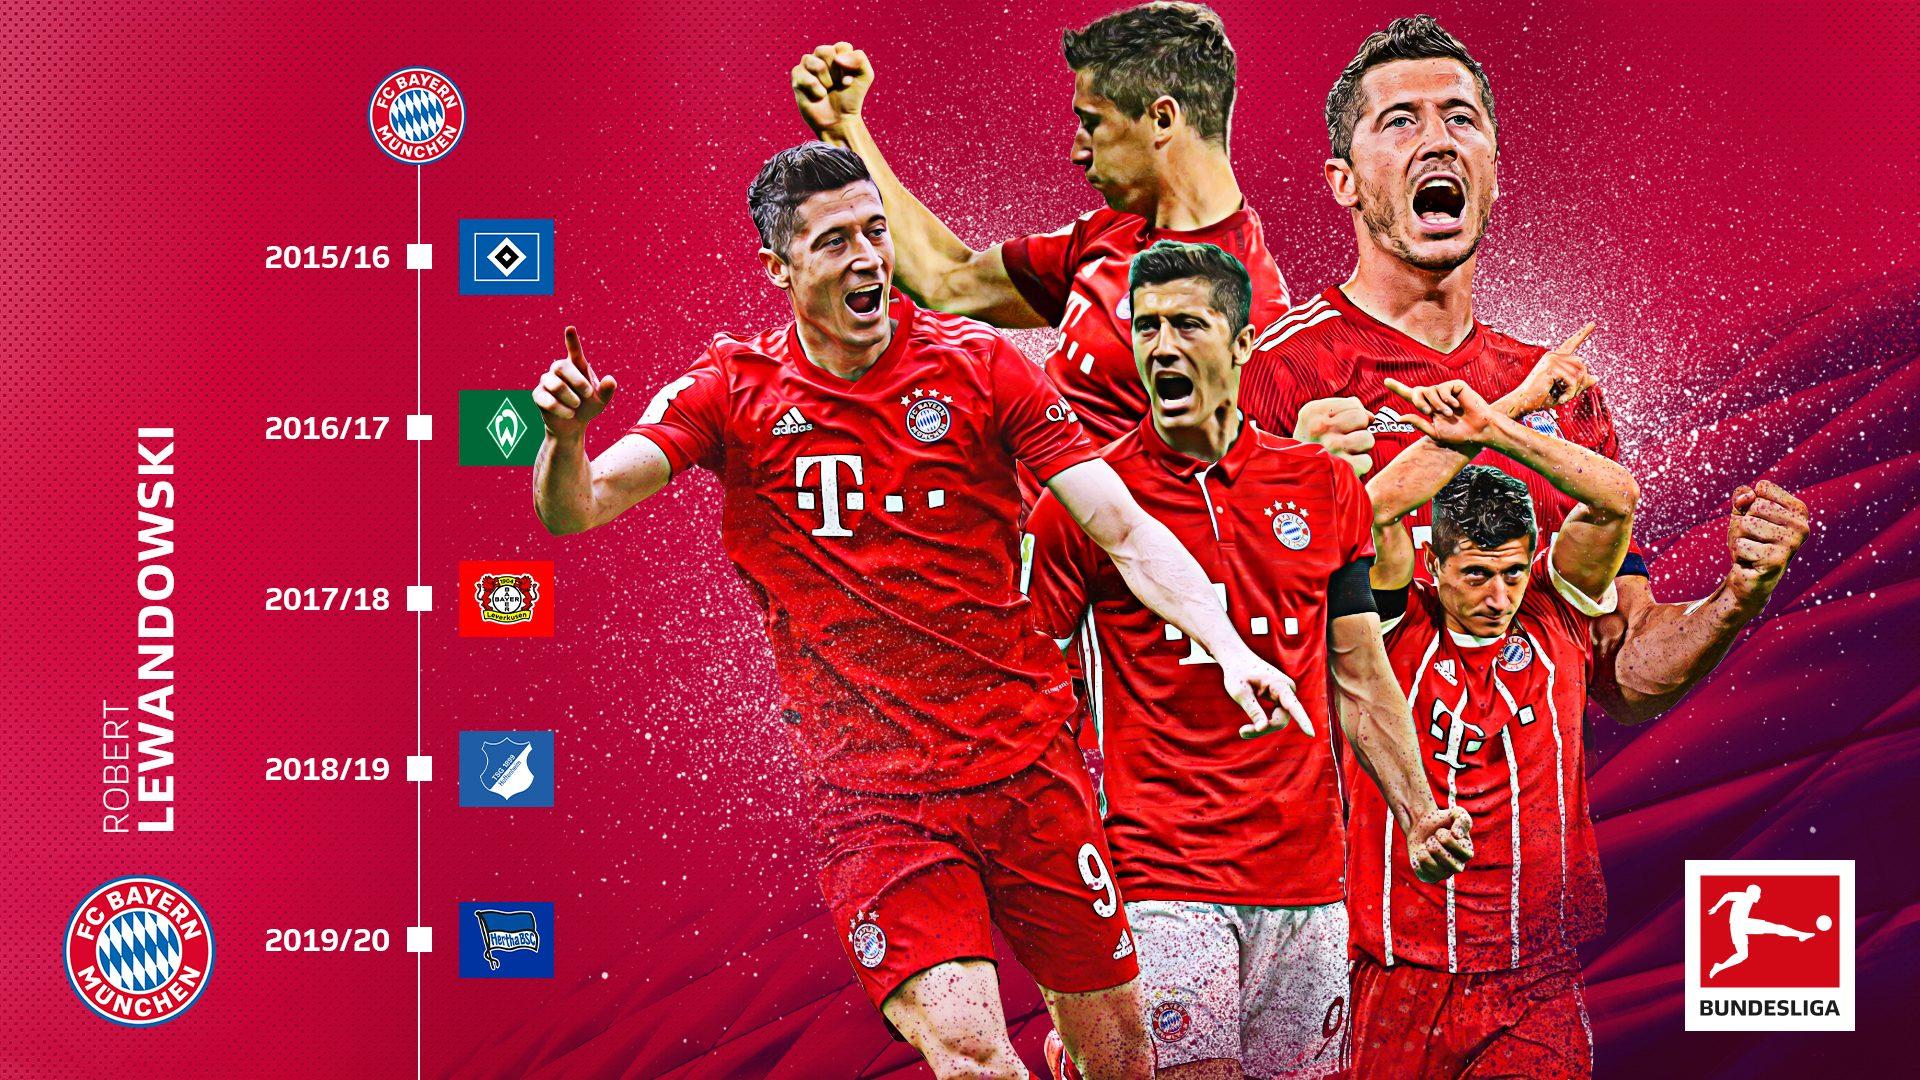 Neuer Bundesliga-Rekord für Robert Lewandowski